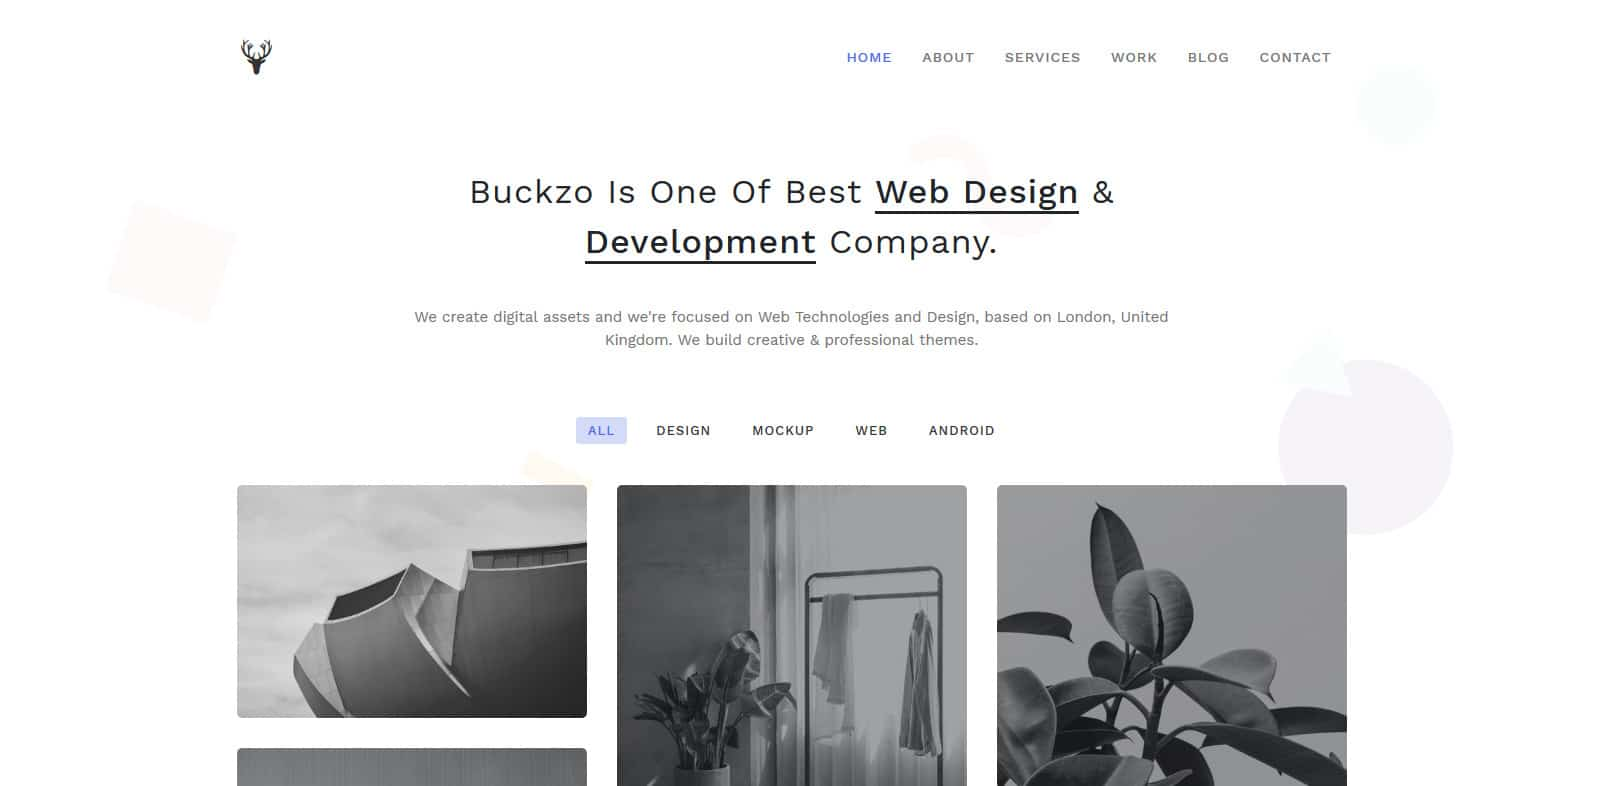 buckzo-simple-website-template